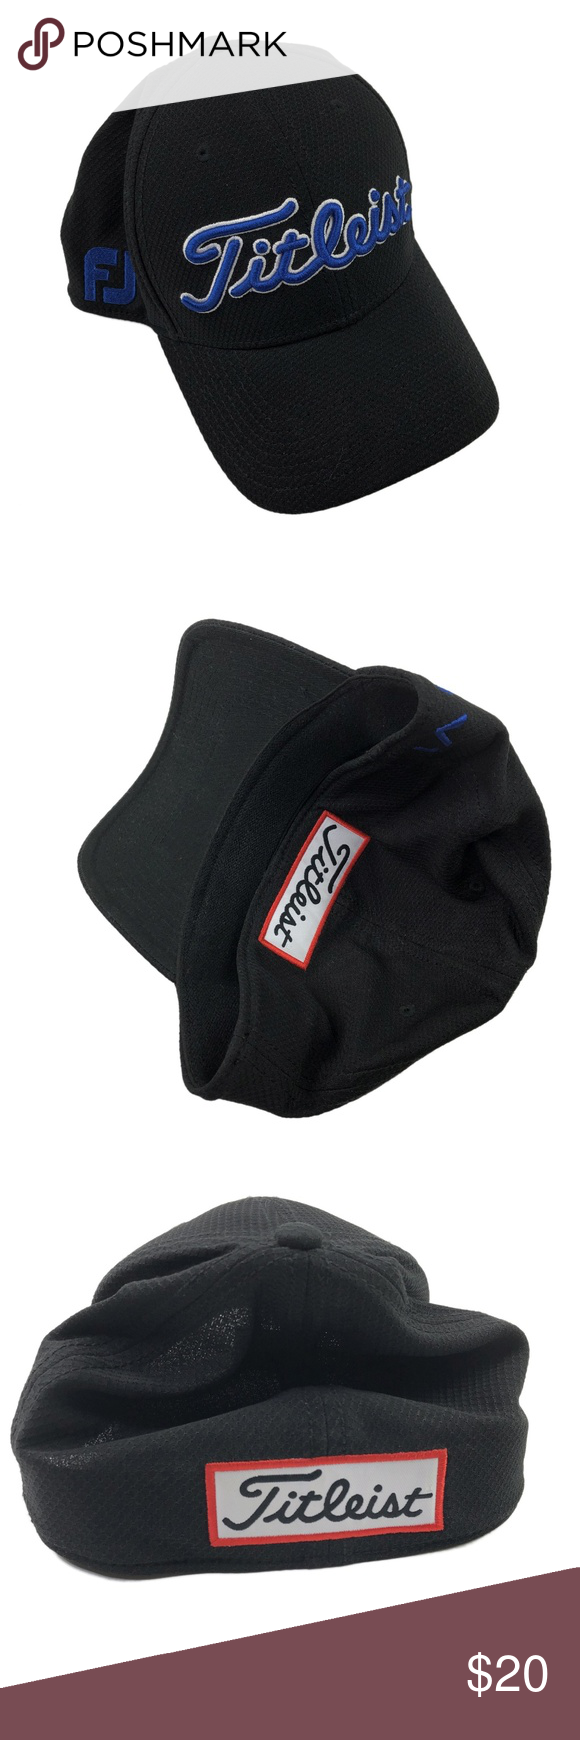 9900174cf3a Titleist Mens Golf Hat Footjoy Black Titleist Golf Hat Adjustable Mens  Medium Large Black Footjoy FJ ProV1 Logos Tagged as M L stretch fit.